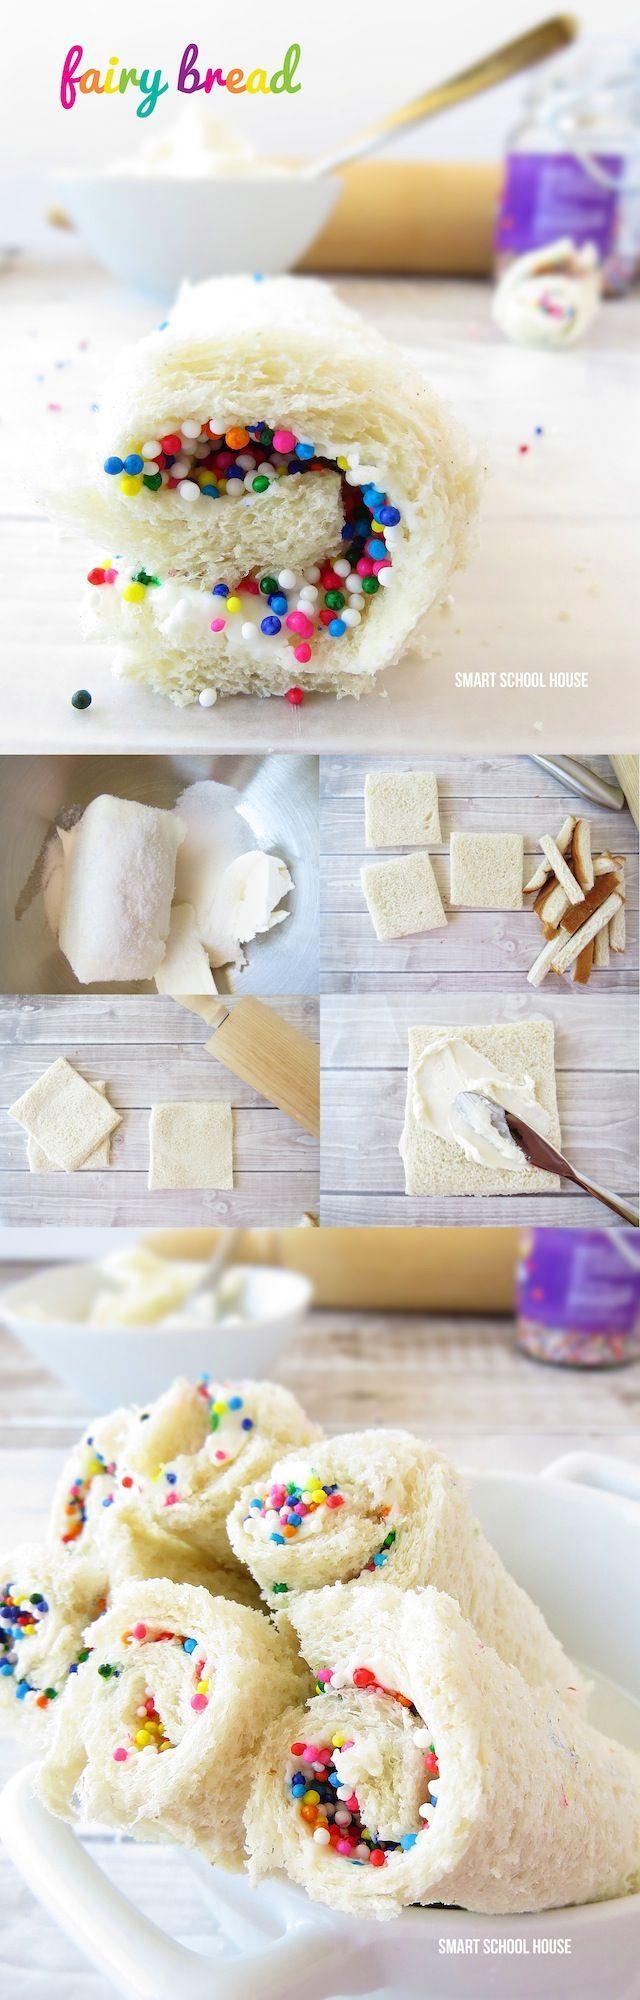 It's called Fairy Bread! This fun DIY recipe idea was such a hit!